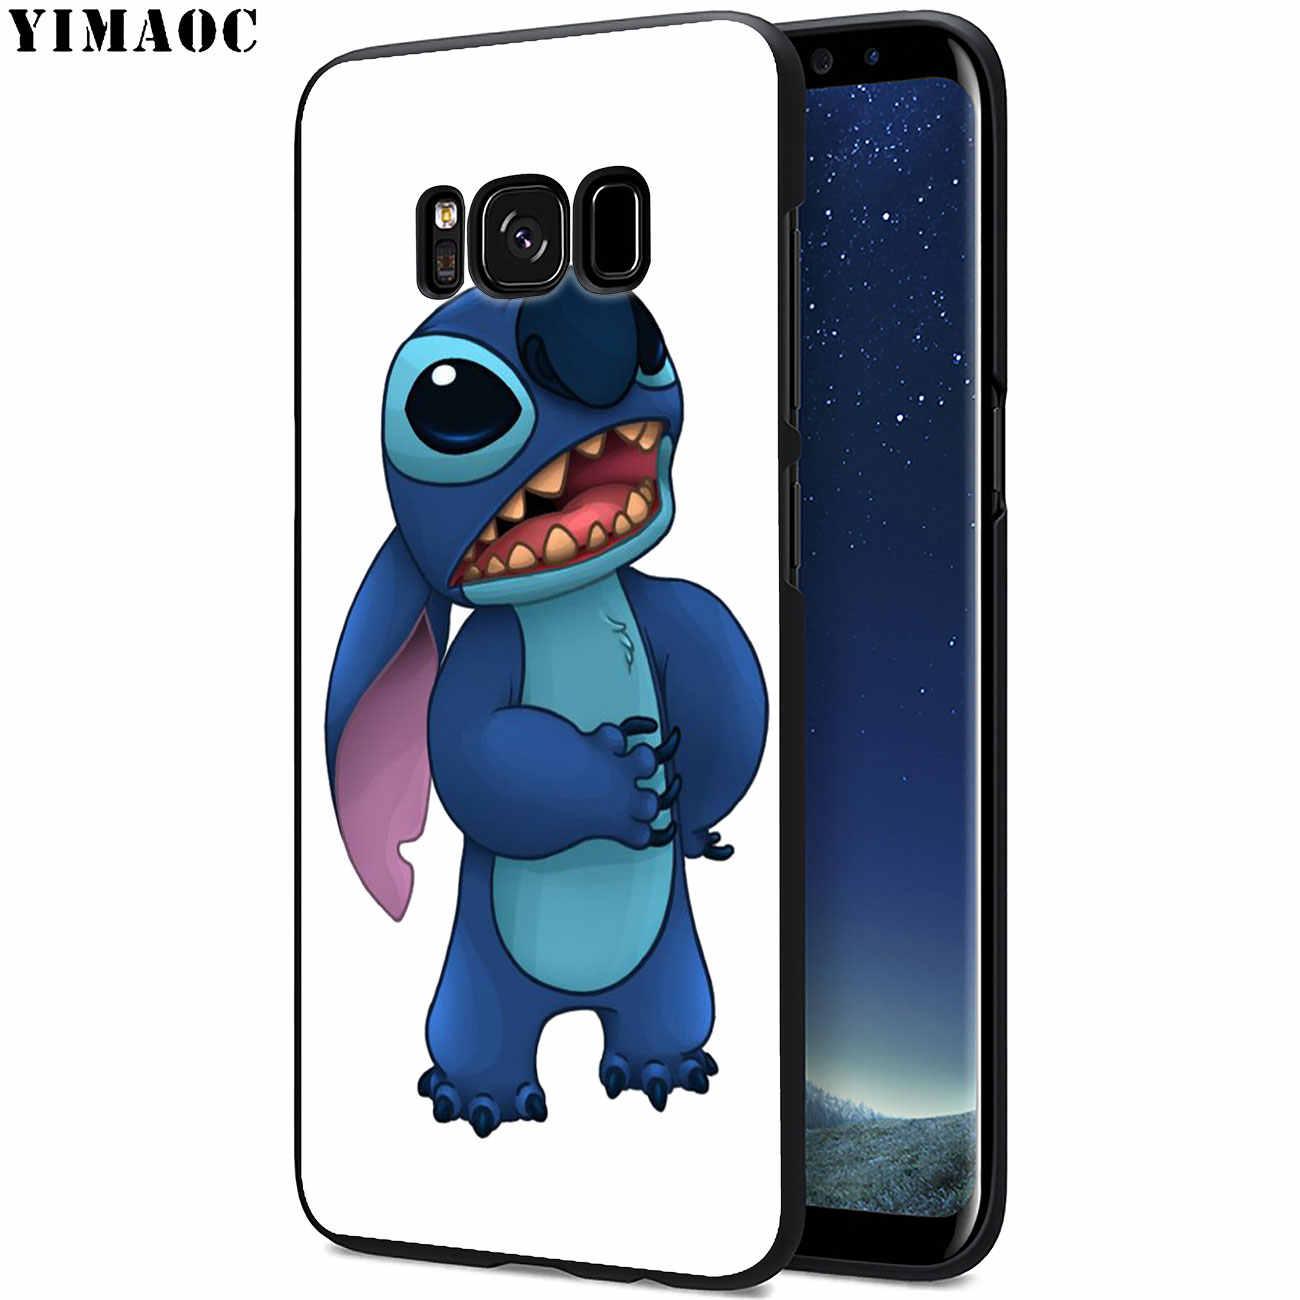 YIMAOC bonito dos desenhos animados do Ponto de Silicone Macio capa Samsung Galaxy S10 Plus S9 S8 Plus S6 S7 Borda S10e E TPU flor Capa Preta